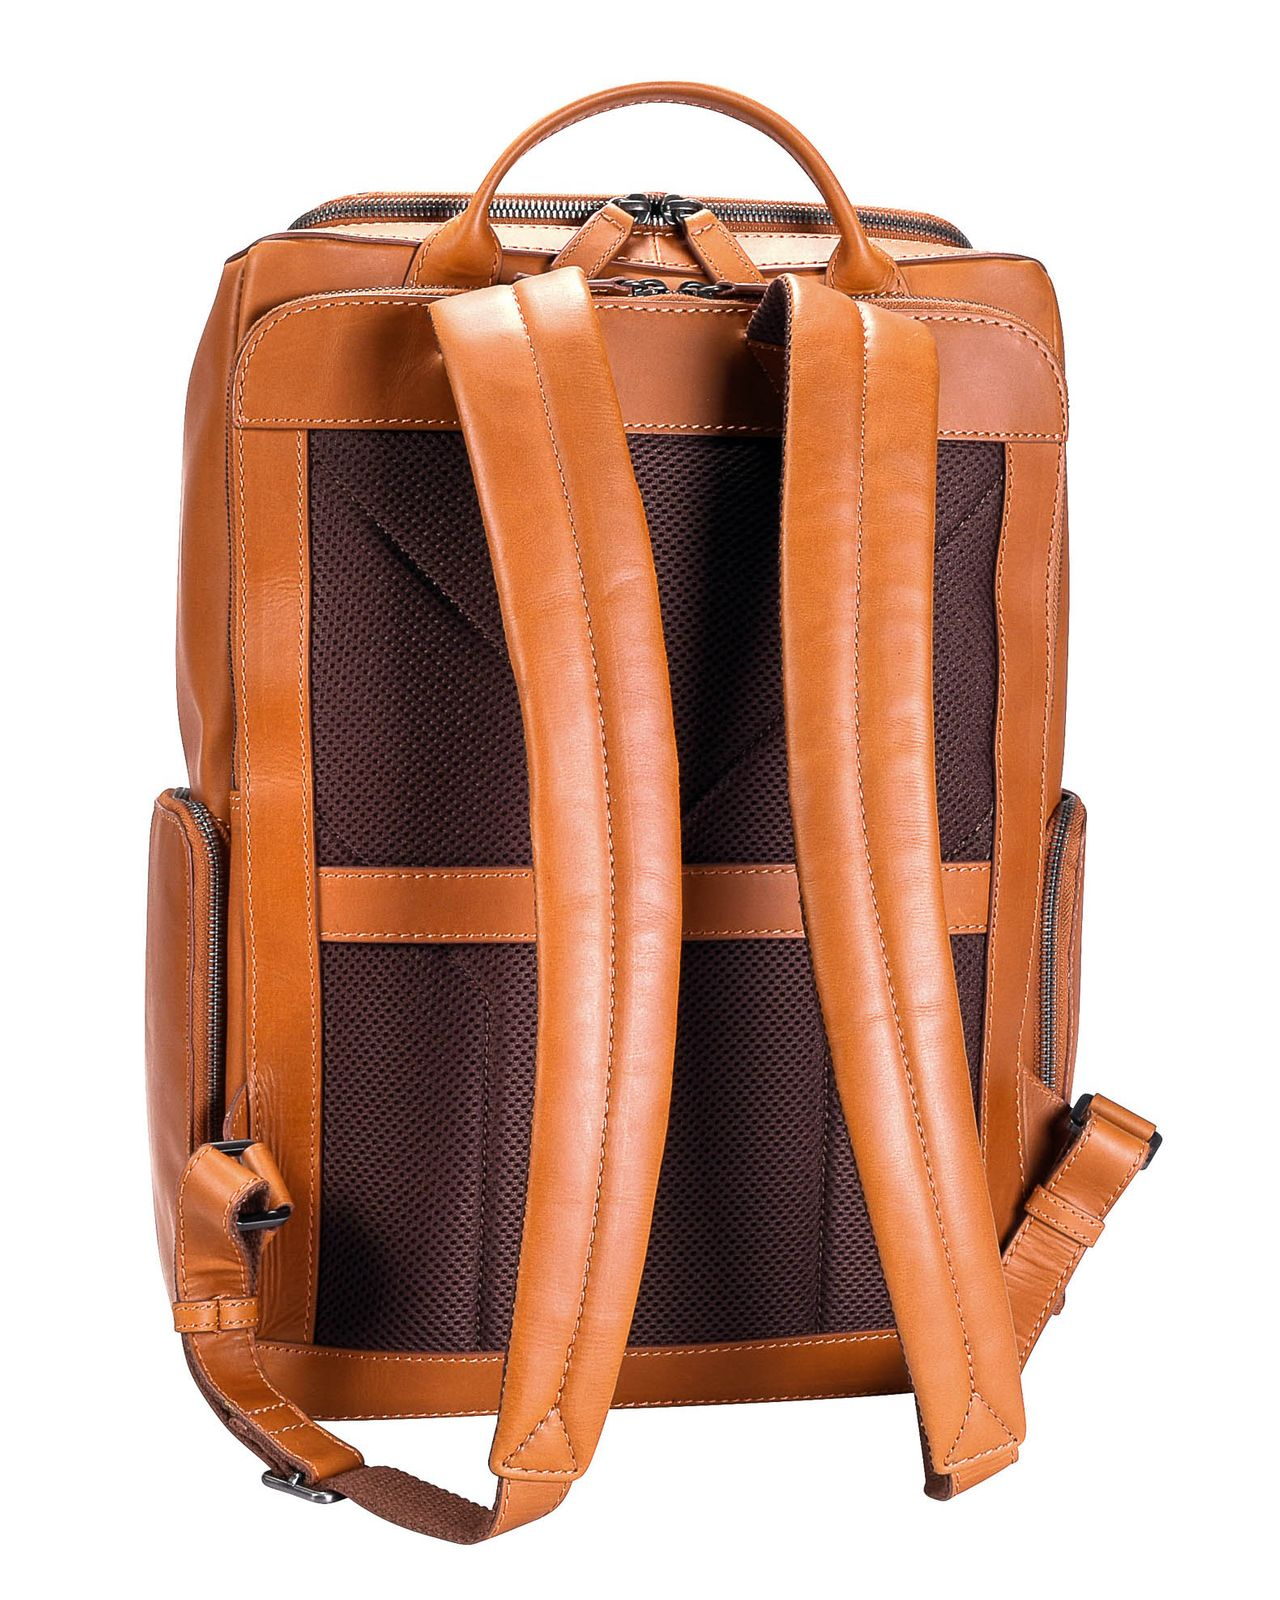 LEONHARD HEYDEN Ottawa Backpack Orange